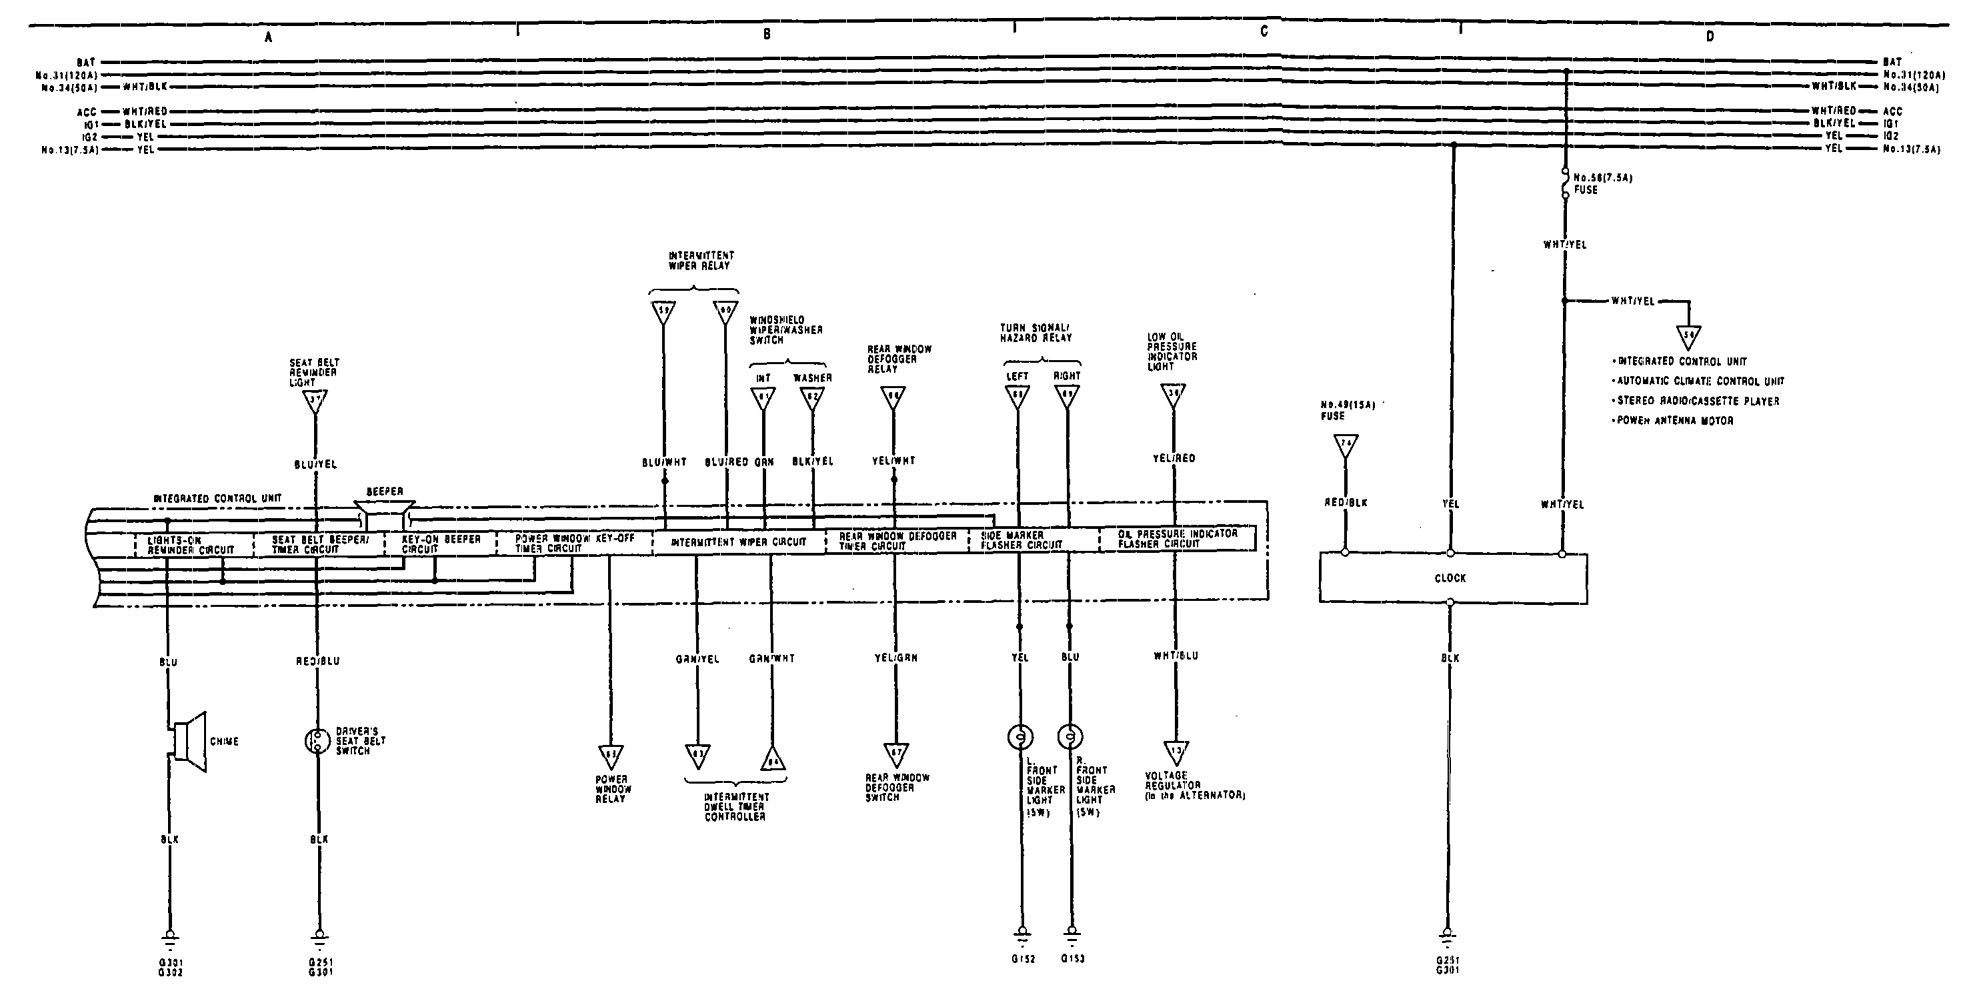 94 acura legend stereo wiring diagram rb25det ecu 1991 1992 driver